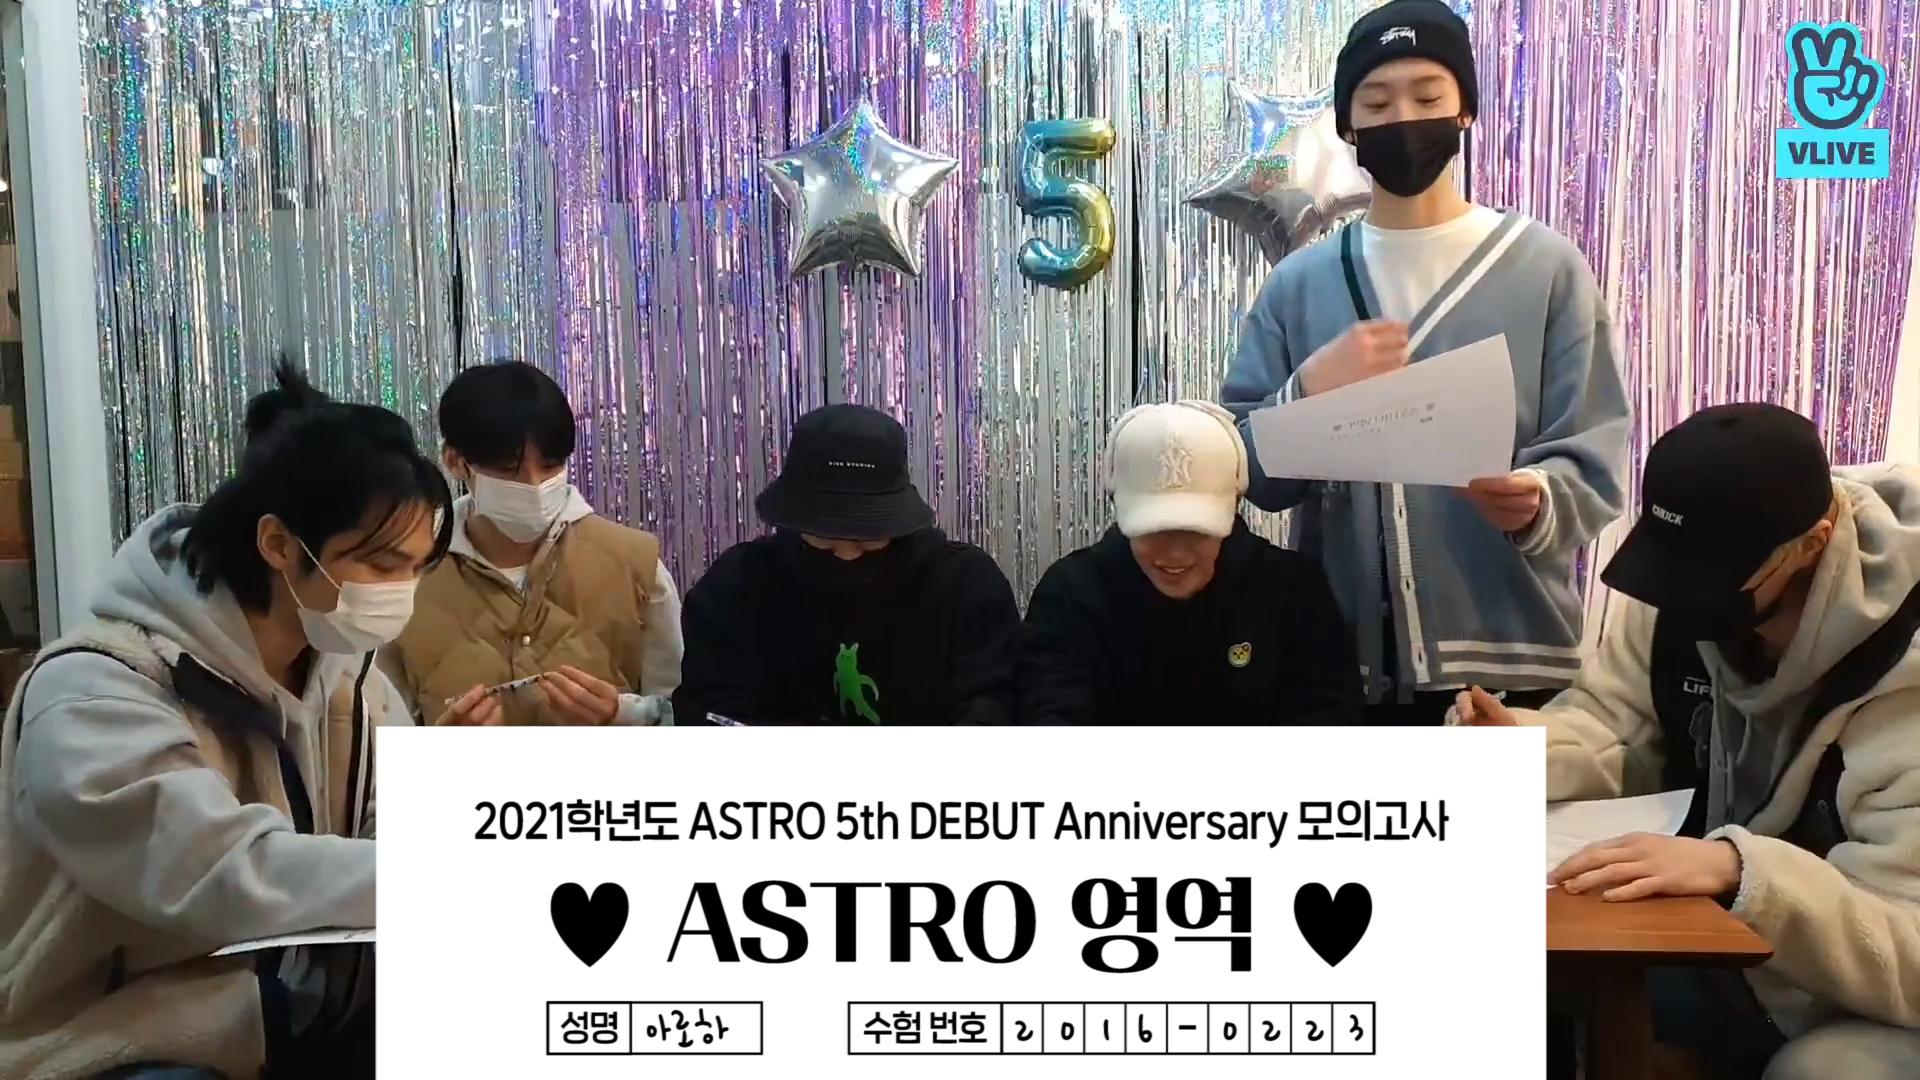 [ASTRO] 벌써 223억번째로 하는 평로하 다짐..🥰💜 (THE 5th ANNIVERSARY OF ASTRO's Debut!)